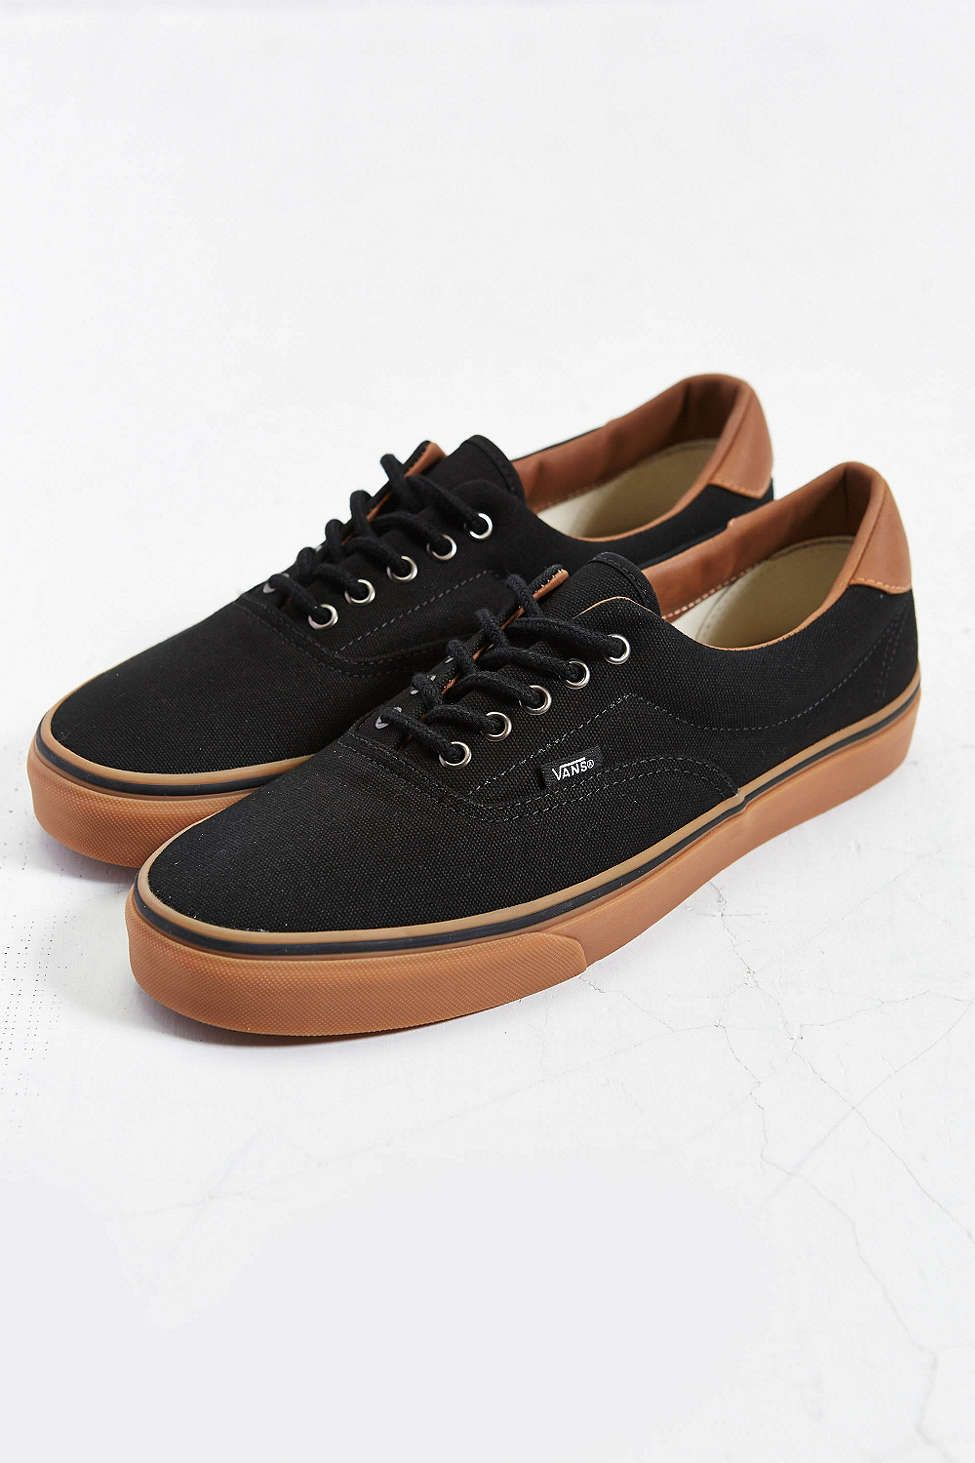 Vans California Era 59 Gumsole Sneaker | Sneakers men fashion ...